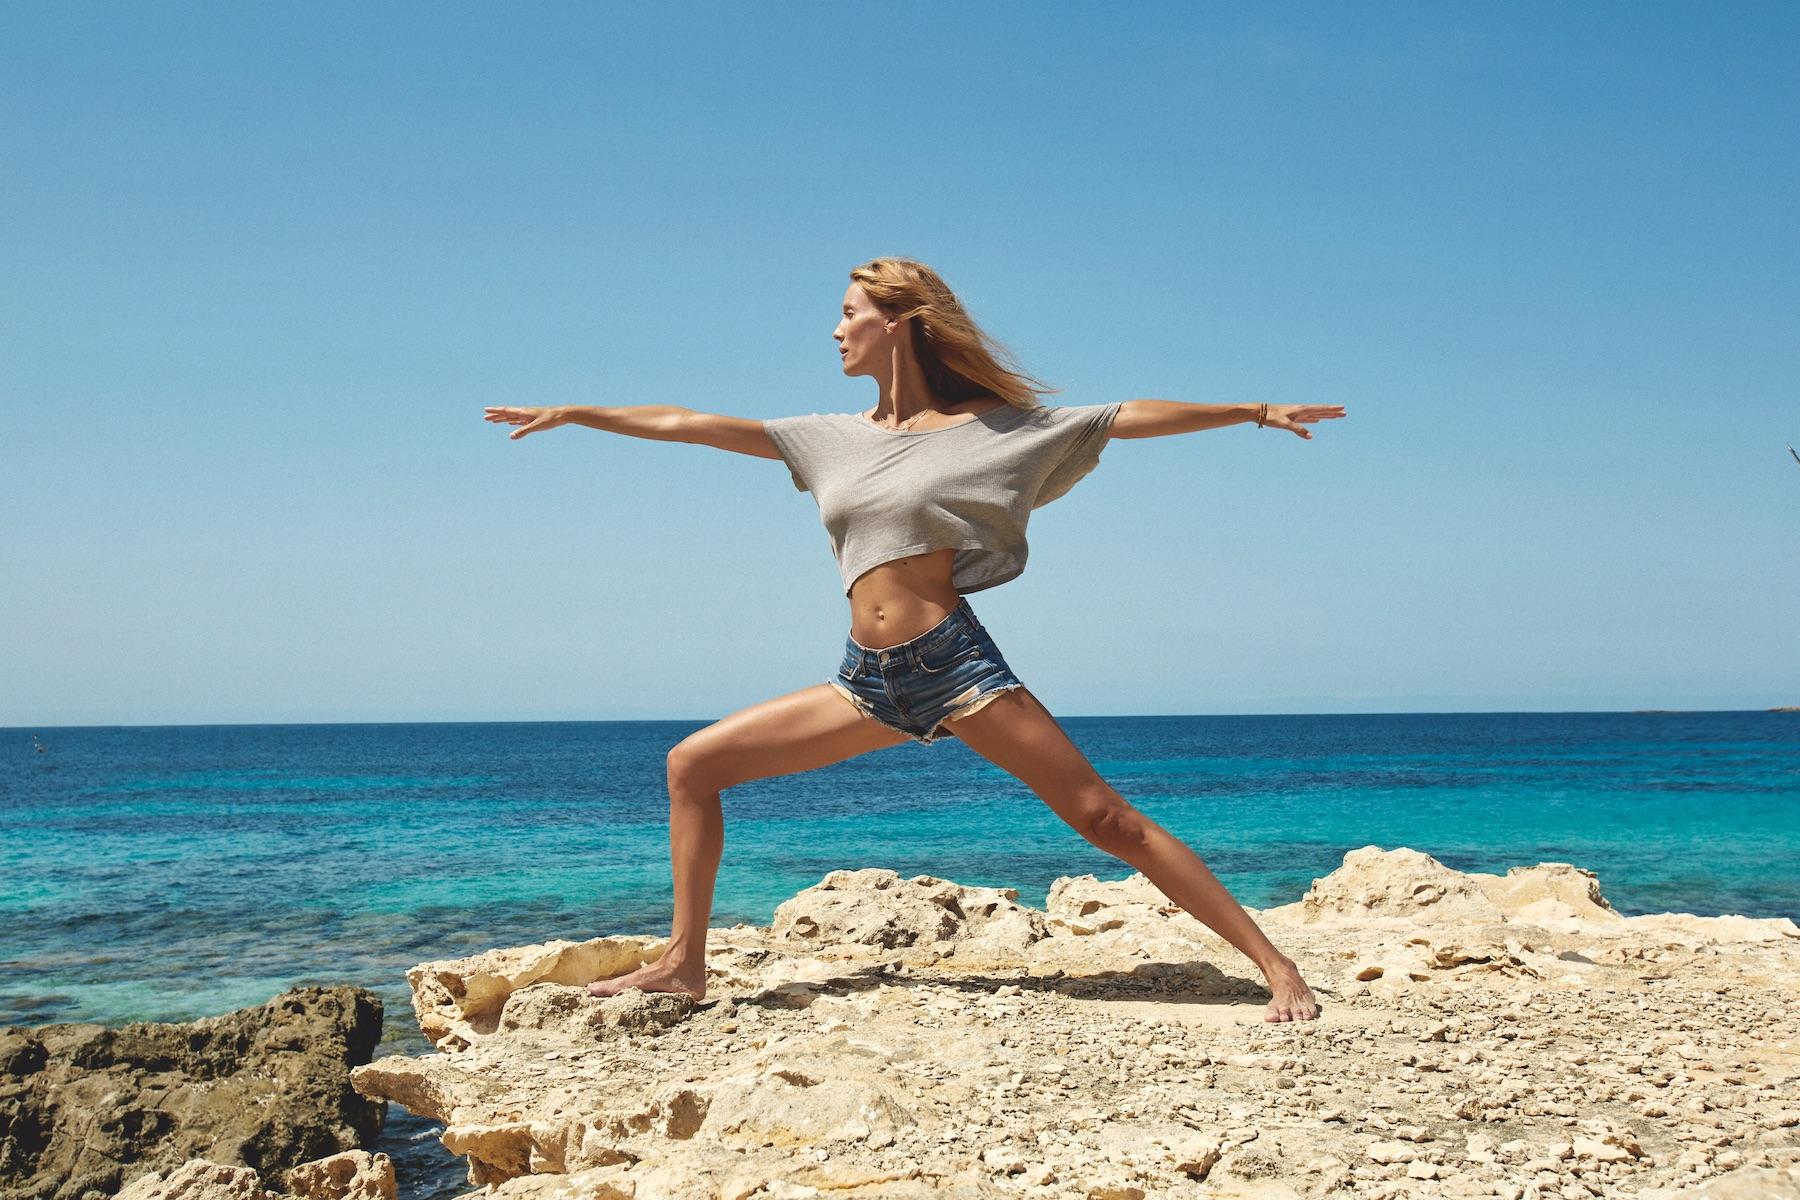 000_Yoga_Ibiza0380 1 copy.jpg